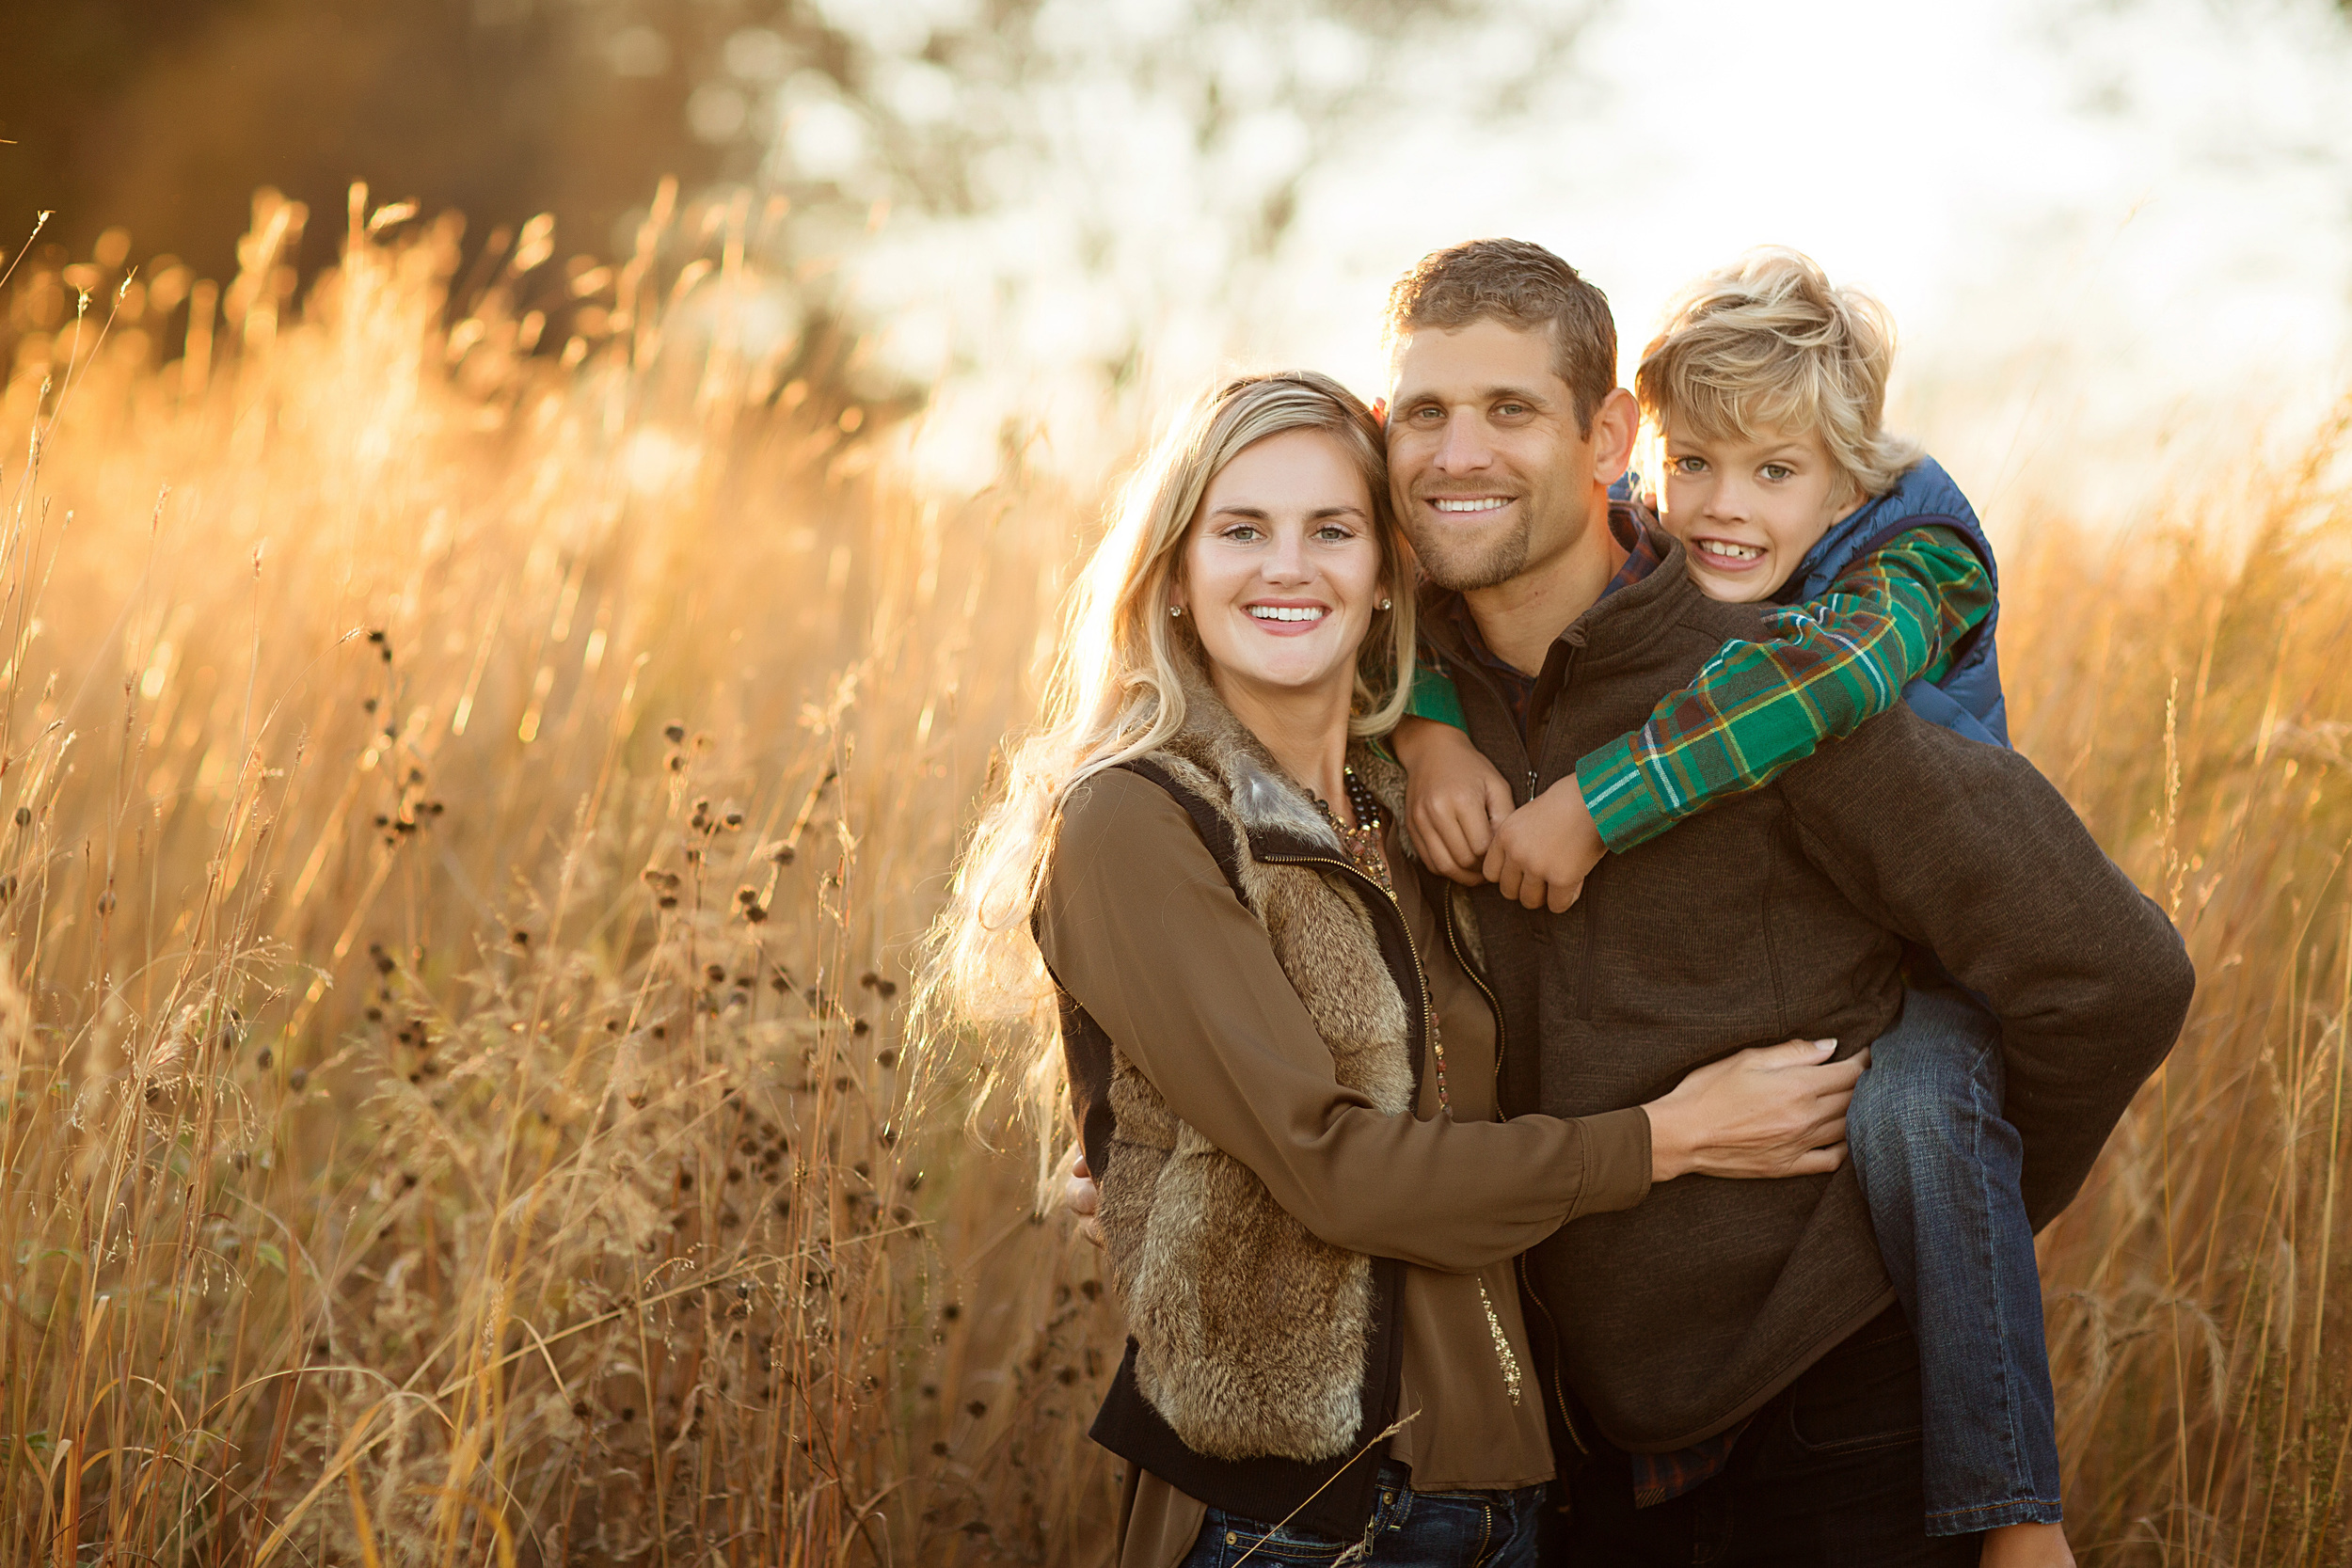 family_portrait_sioux_falls_Shalista0012.jpg